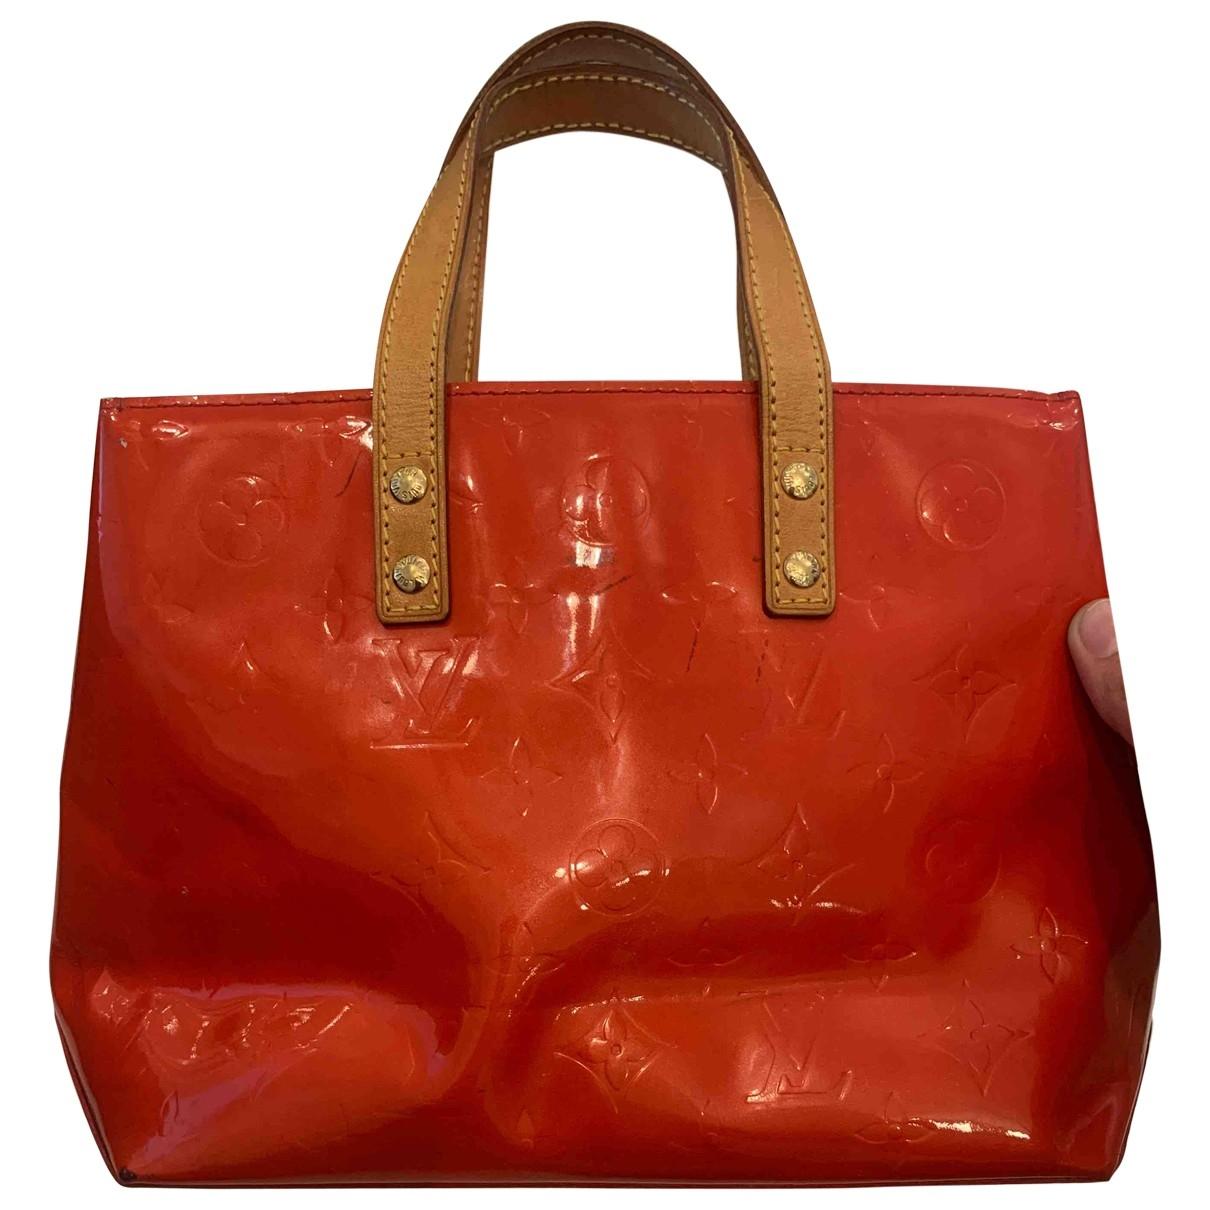 Louis Vuitton Catalina Handtasche in  Rot Lackleder